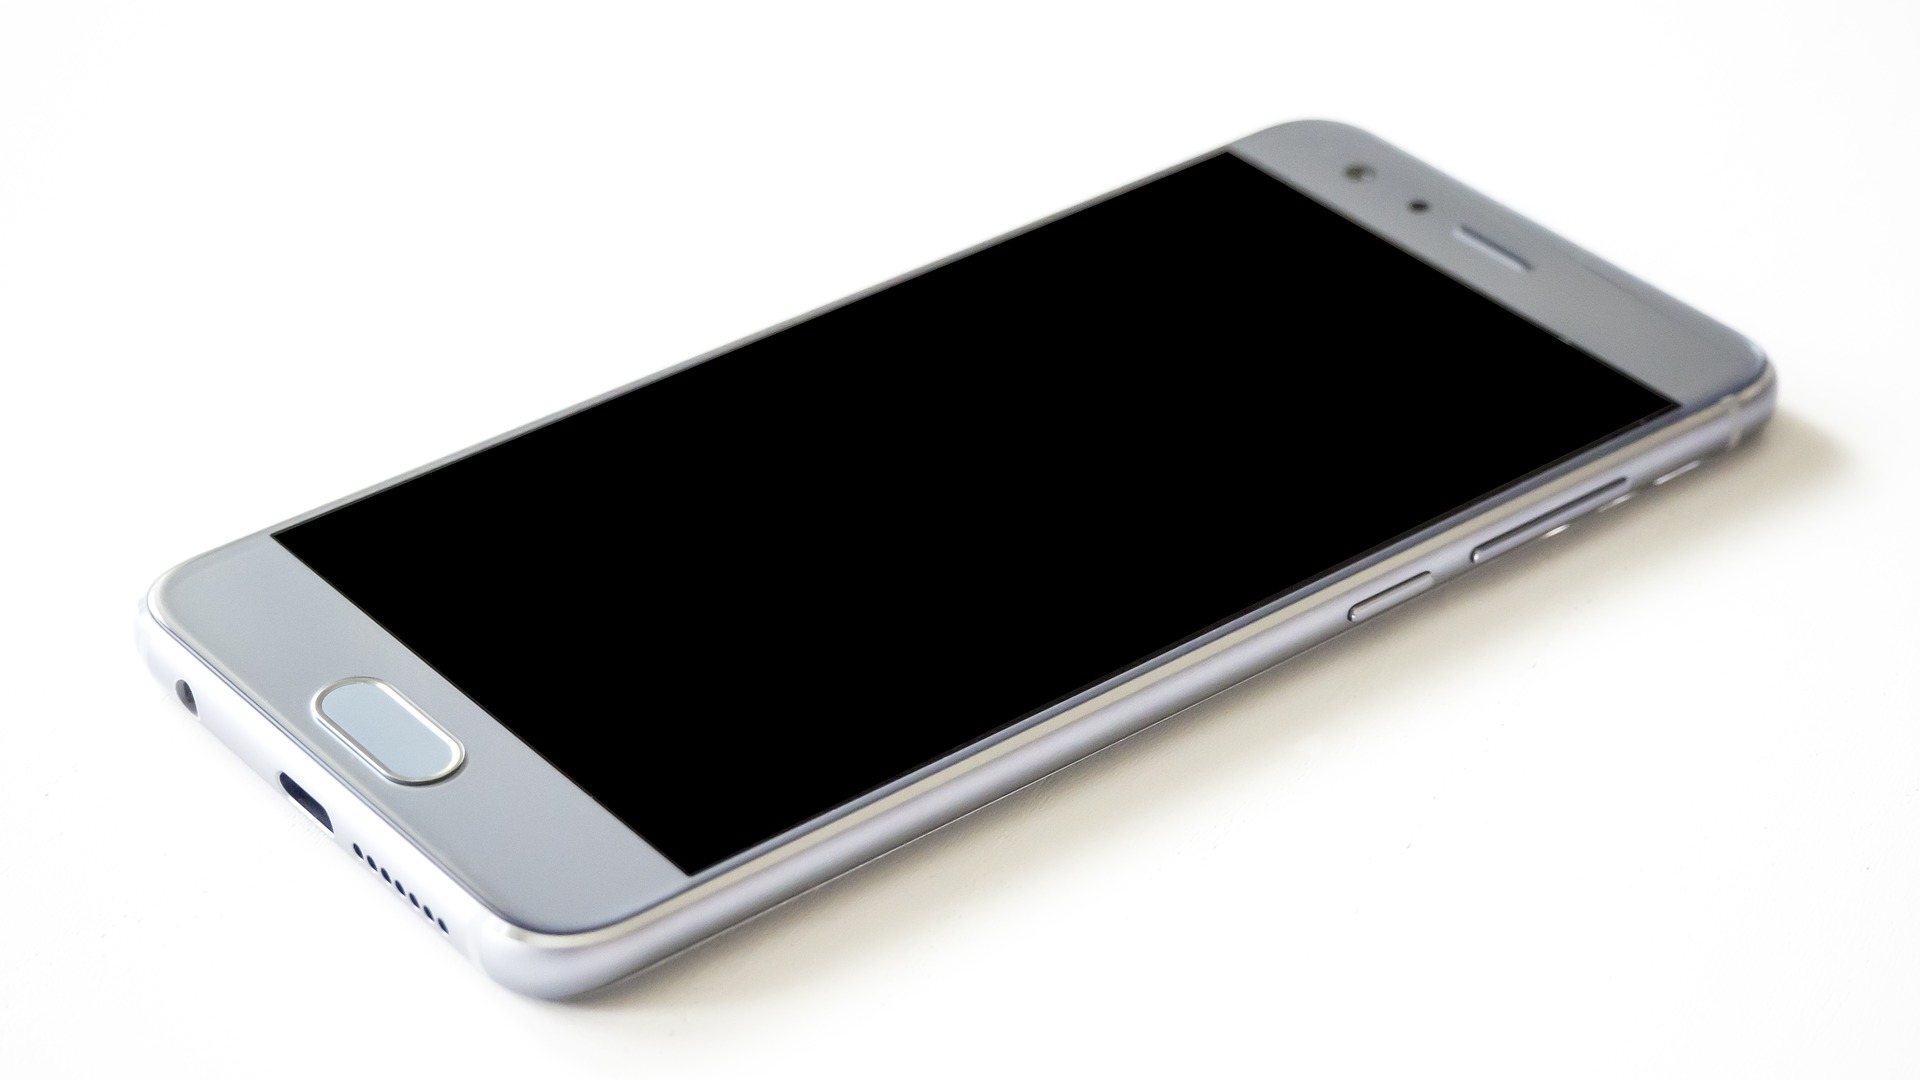 Tech trade war could compel Huawei toward 'plan B' for its smartphones